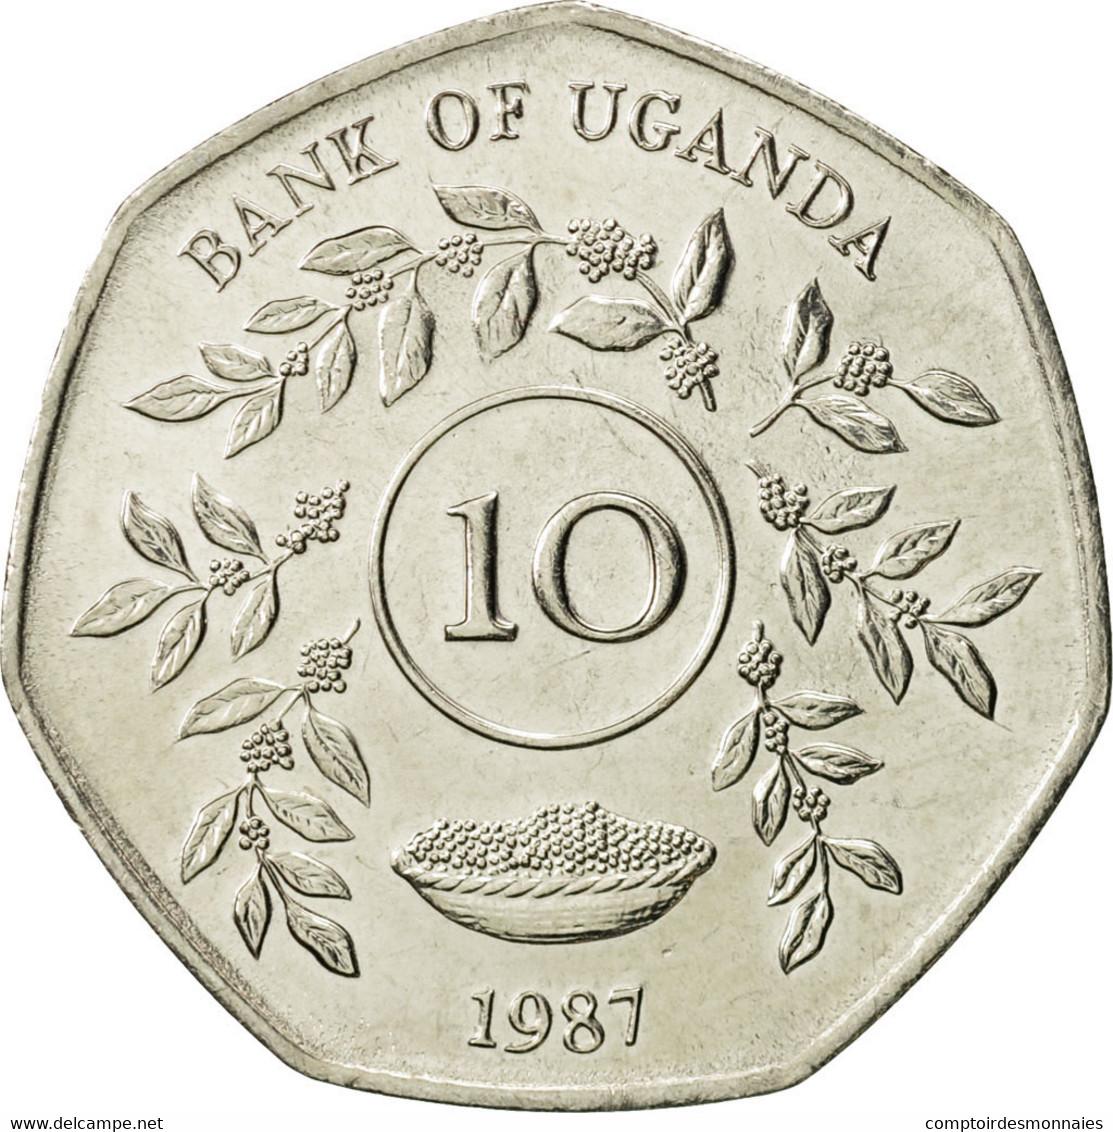 Uganda, 10 Shillings, 1987, SPL, Nickel Plated Steel, KM:30 - Ouganda